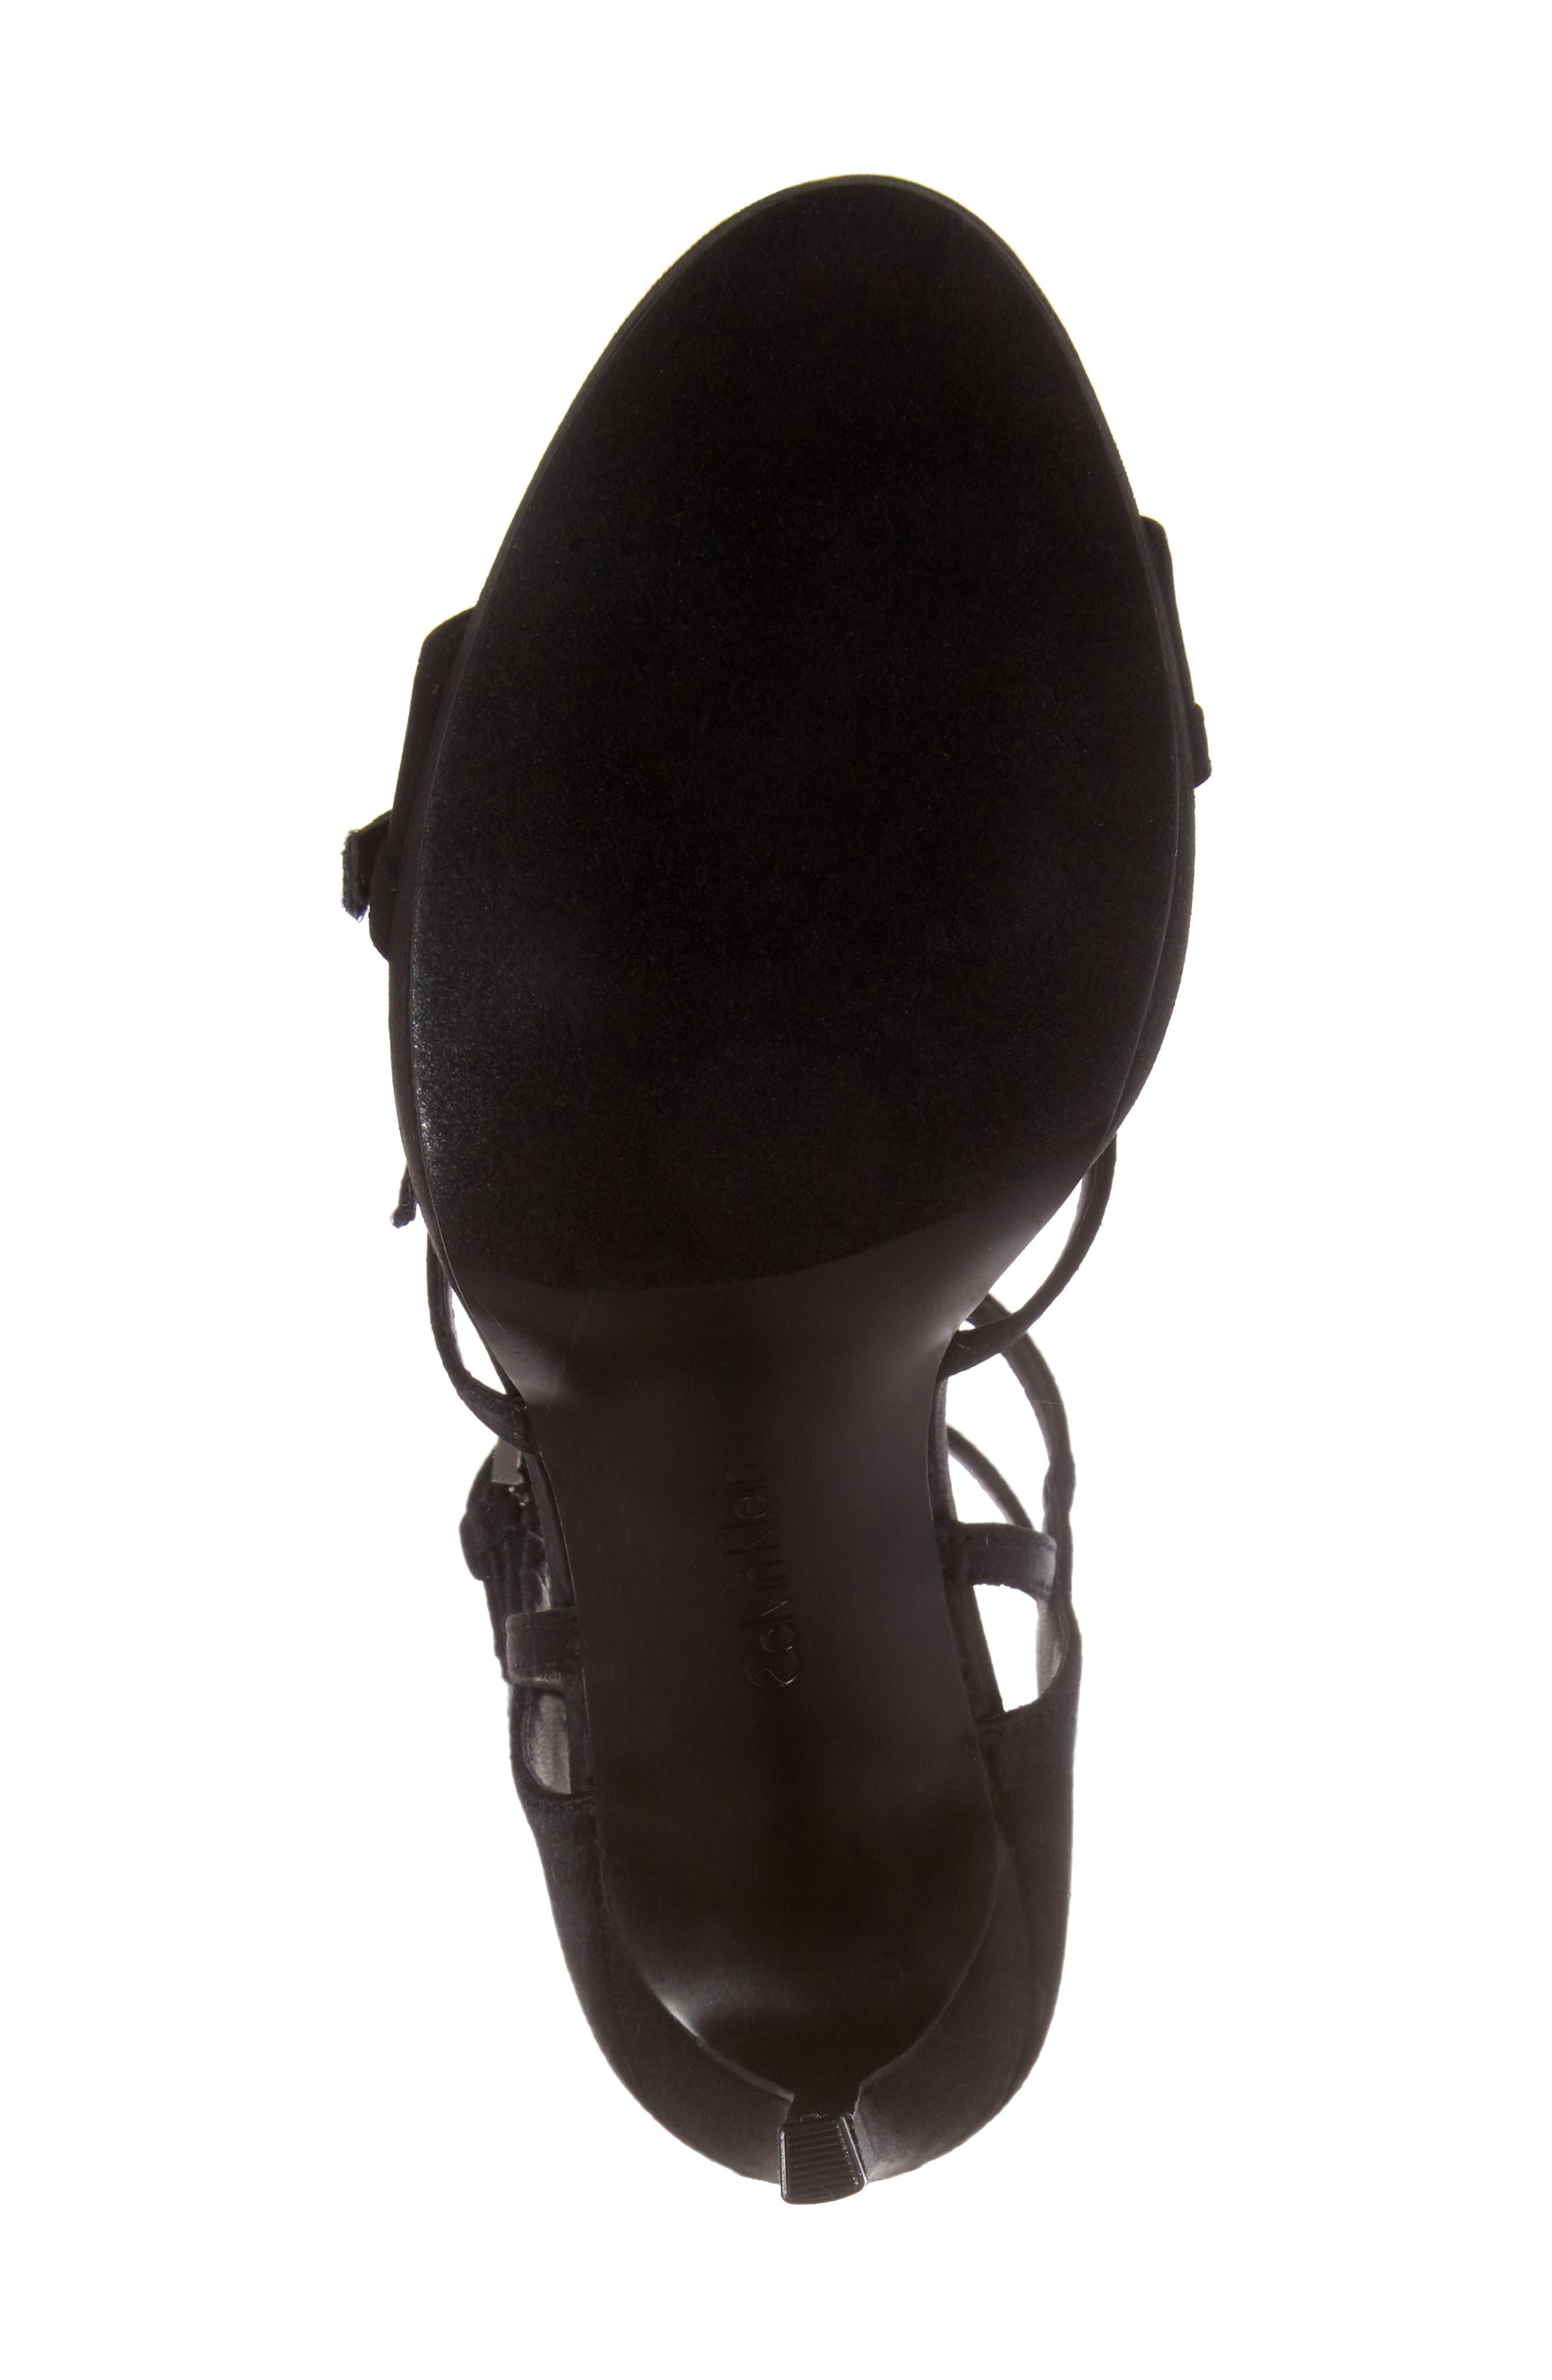 Shantell Strappy Platform Sandal,                             Alternate thumbnail 6, color,                             001